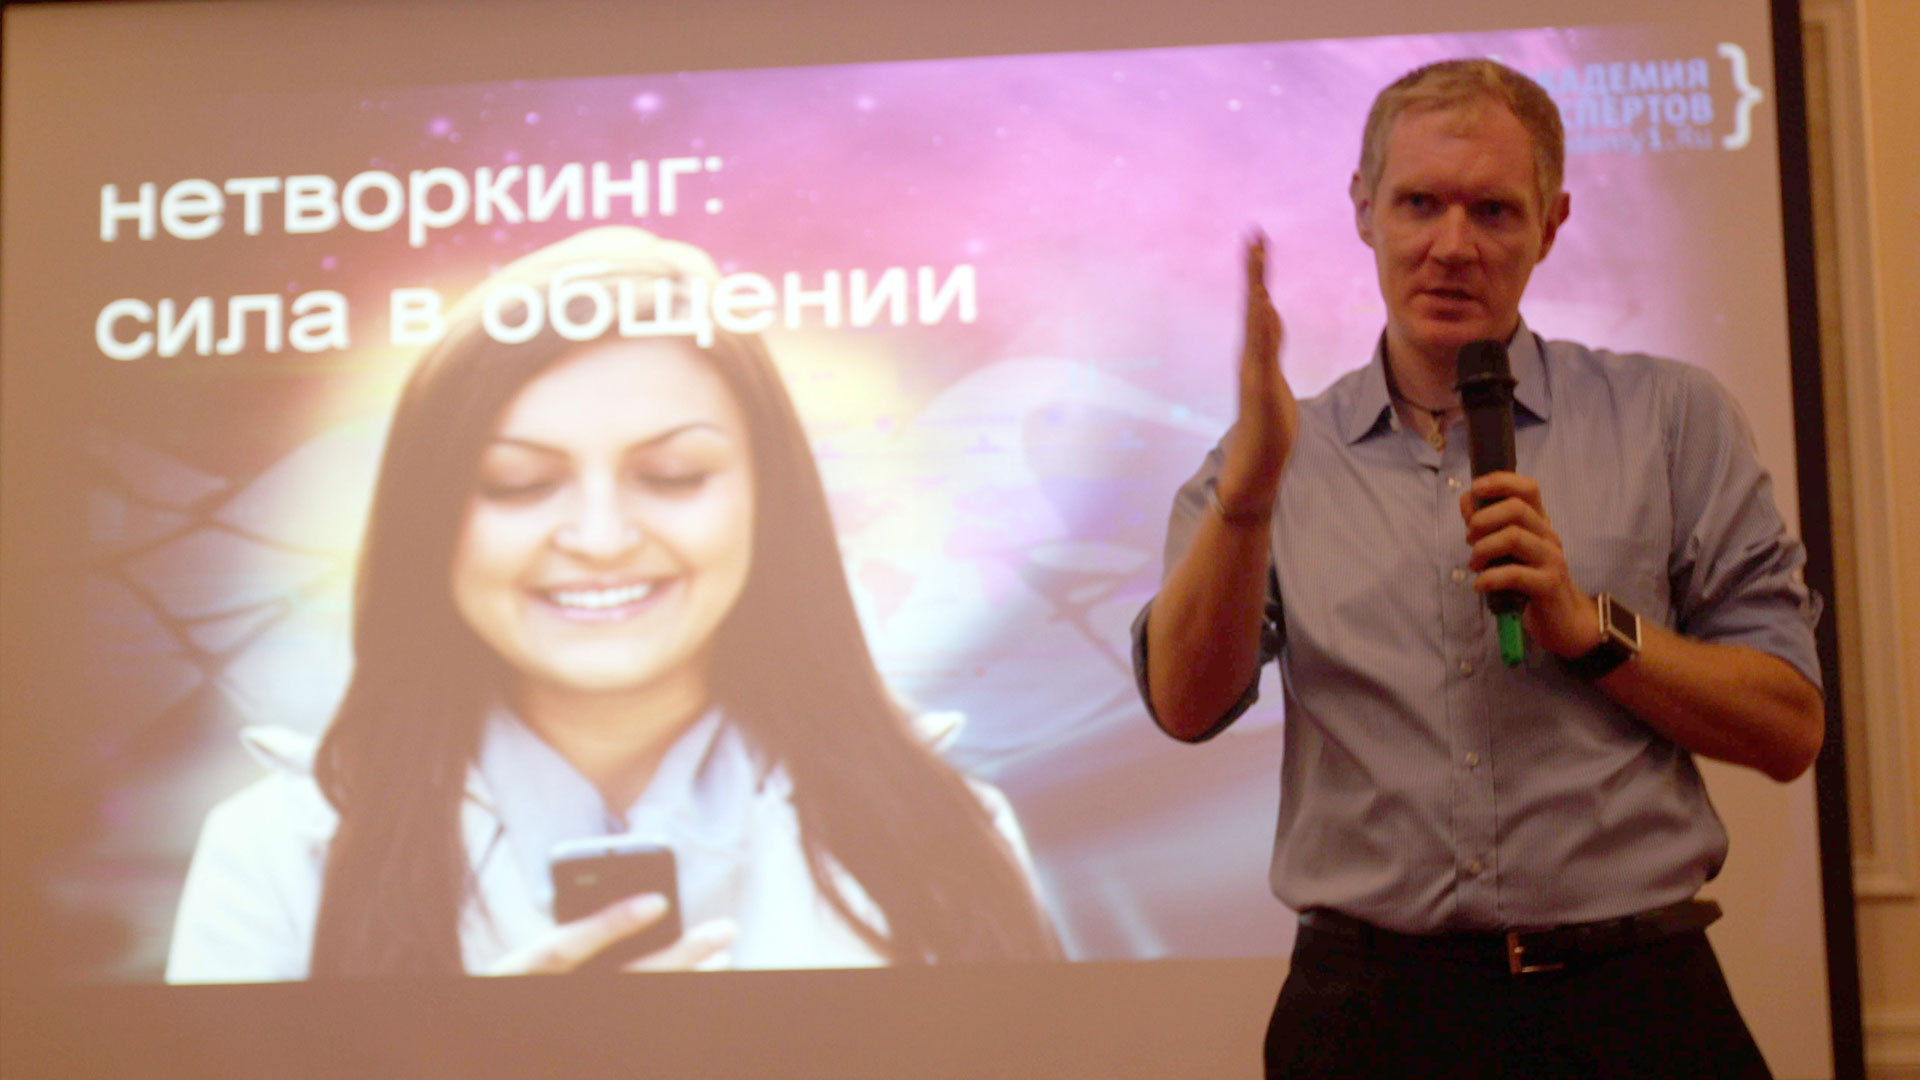 Тренинги Леонида Бугаева